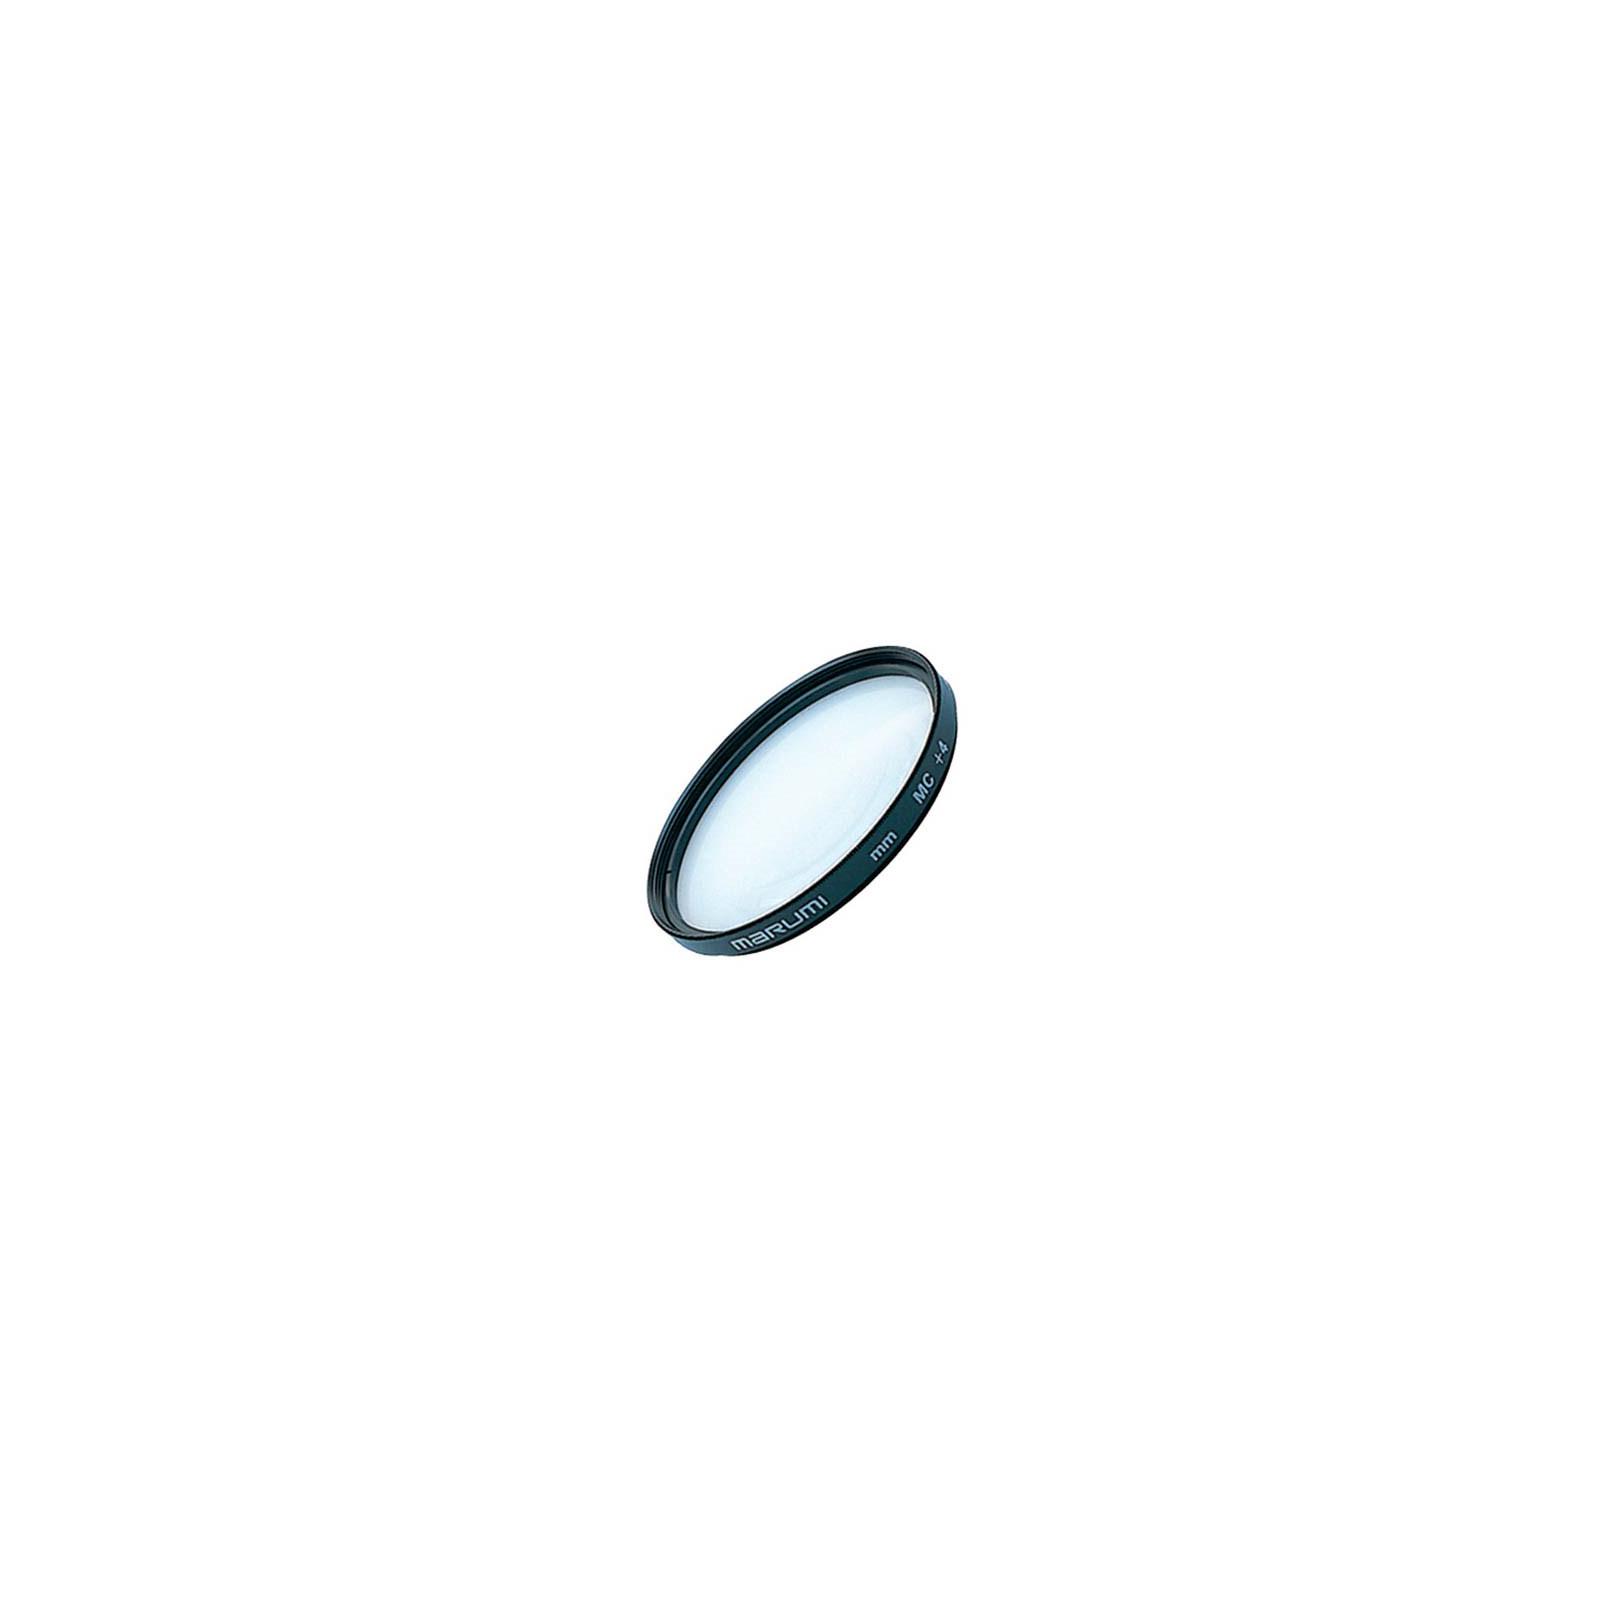 Светофильтр Marumi Close-up+4 72mm